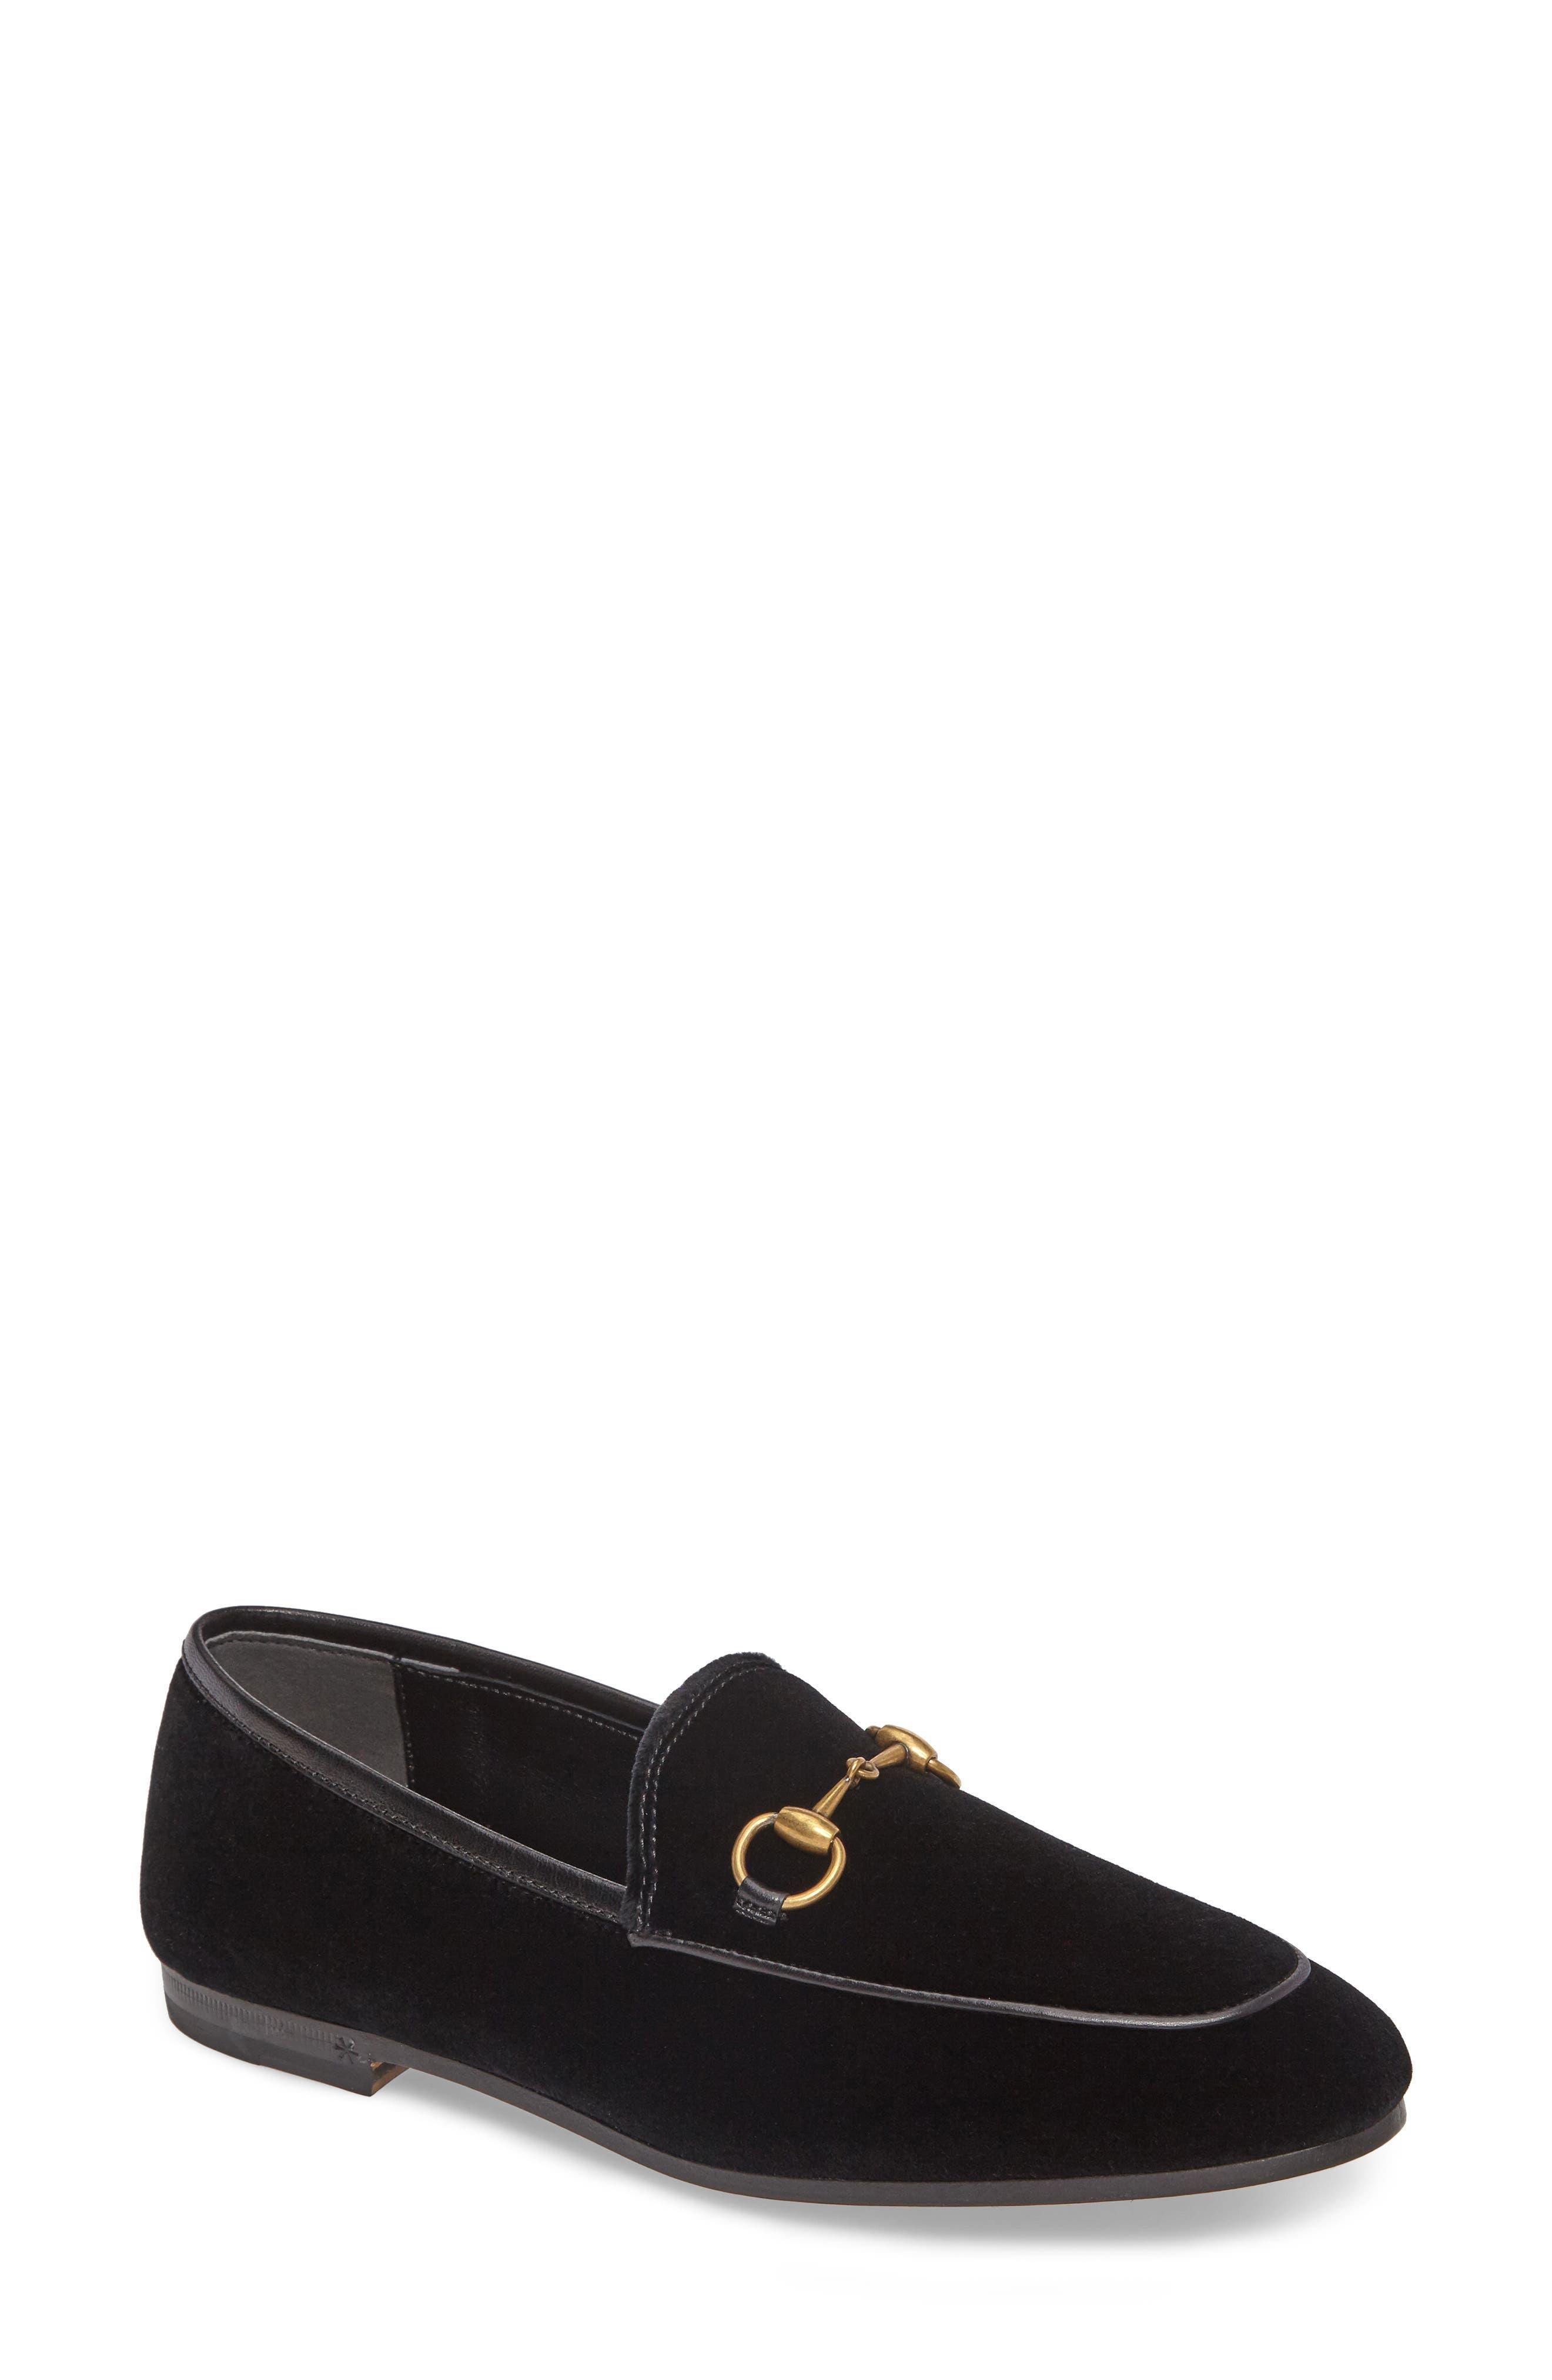 Brixton Velvet Loafer,                         Main,                         color, 001